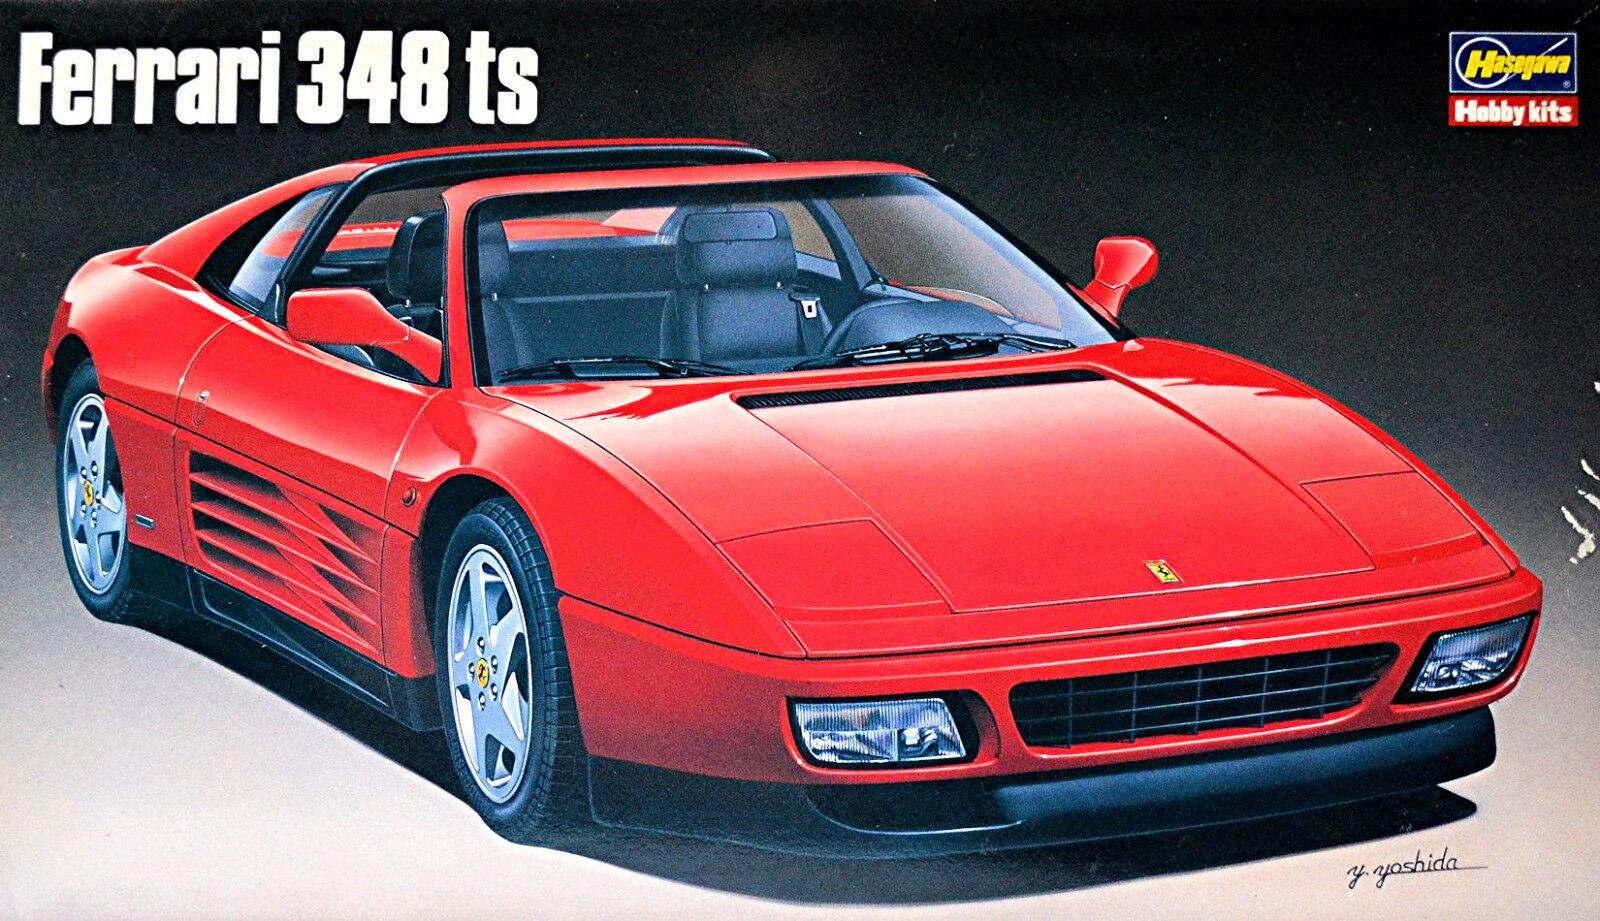 Ferrari 348 Ts Targa Version 1989-93 - 1 24 Kit Kit Hasegawa CA-8